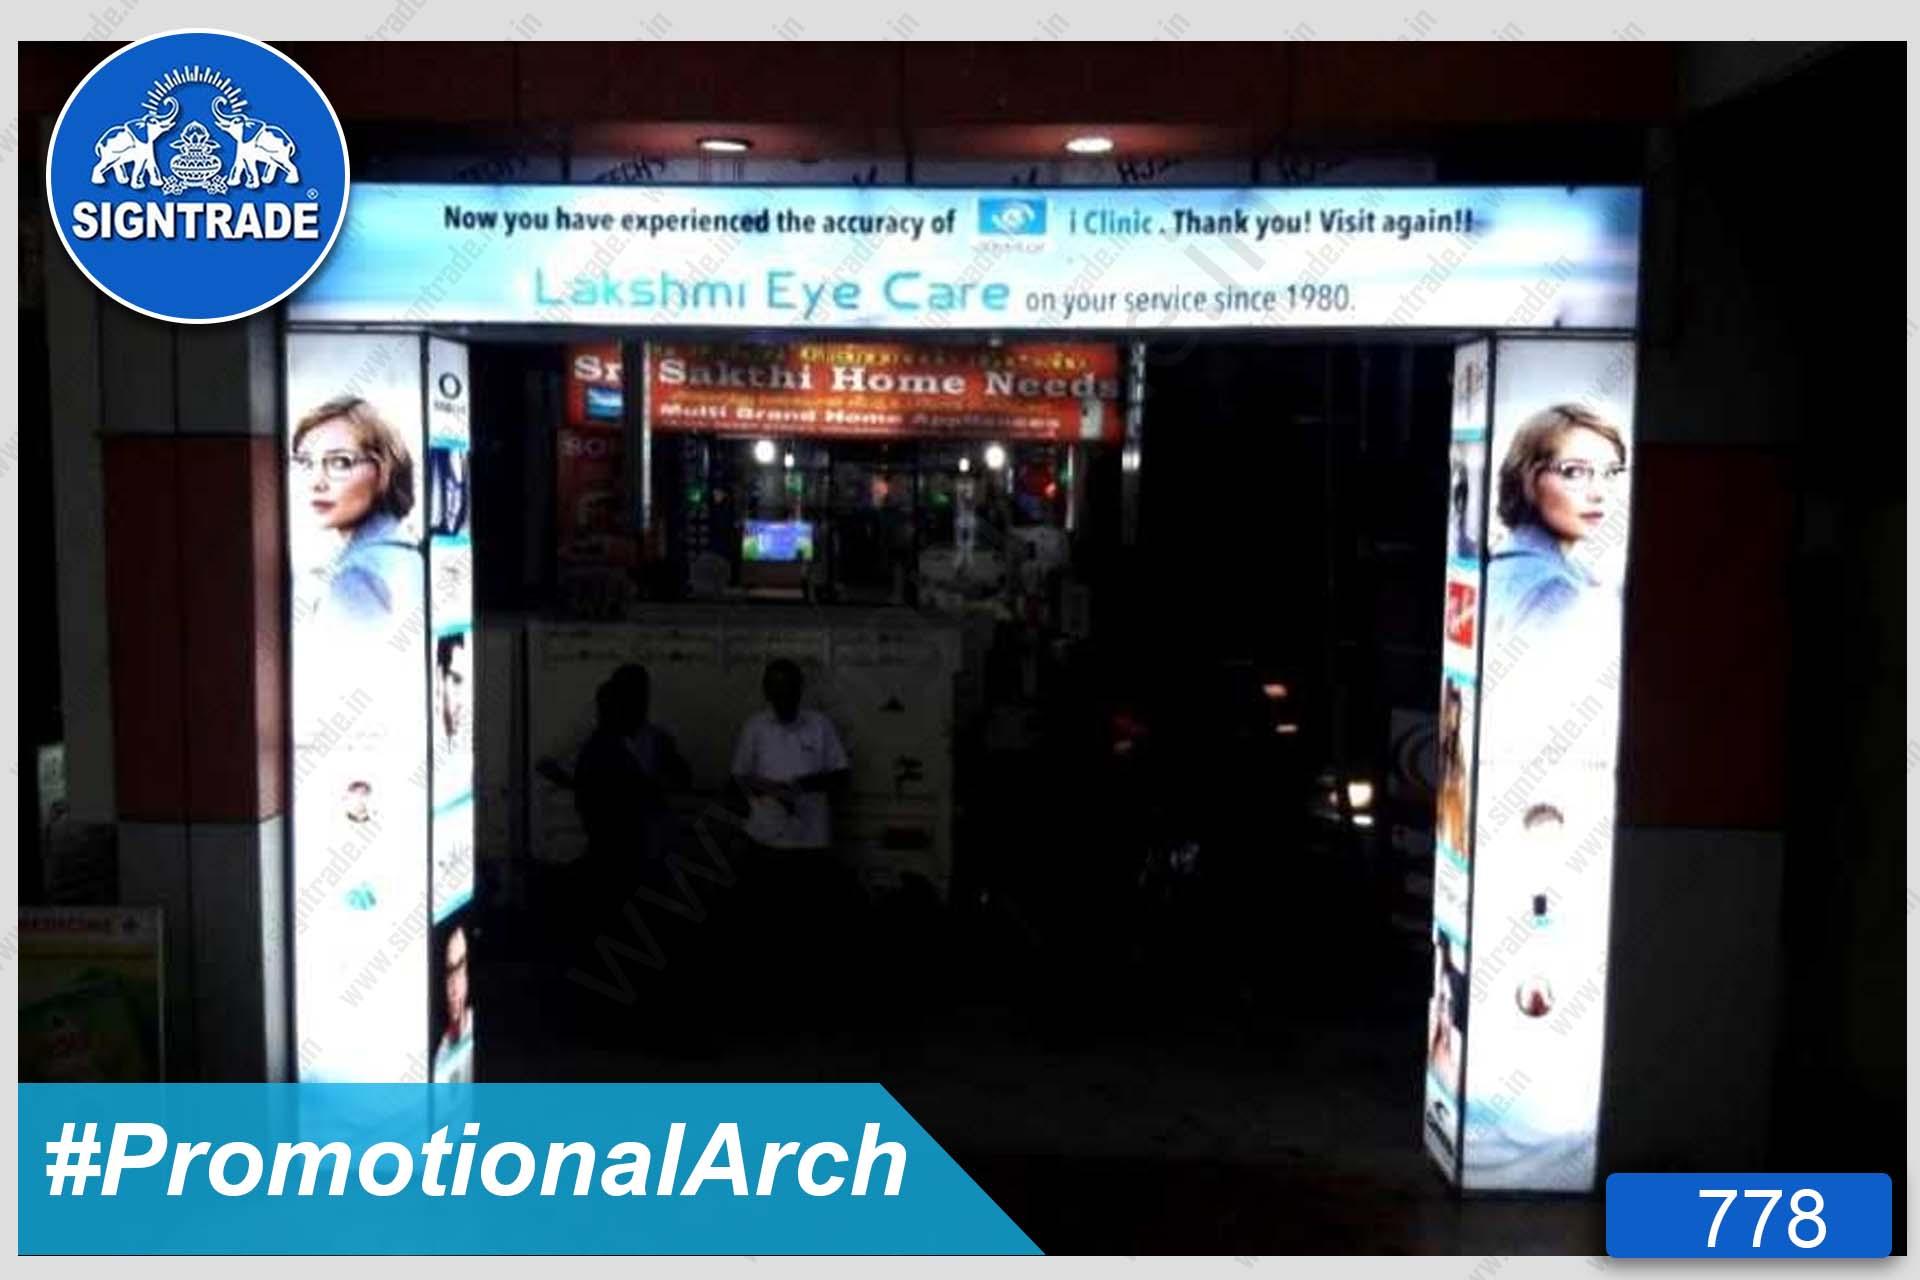 Lakshmi Eye Care - Promotional Arch